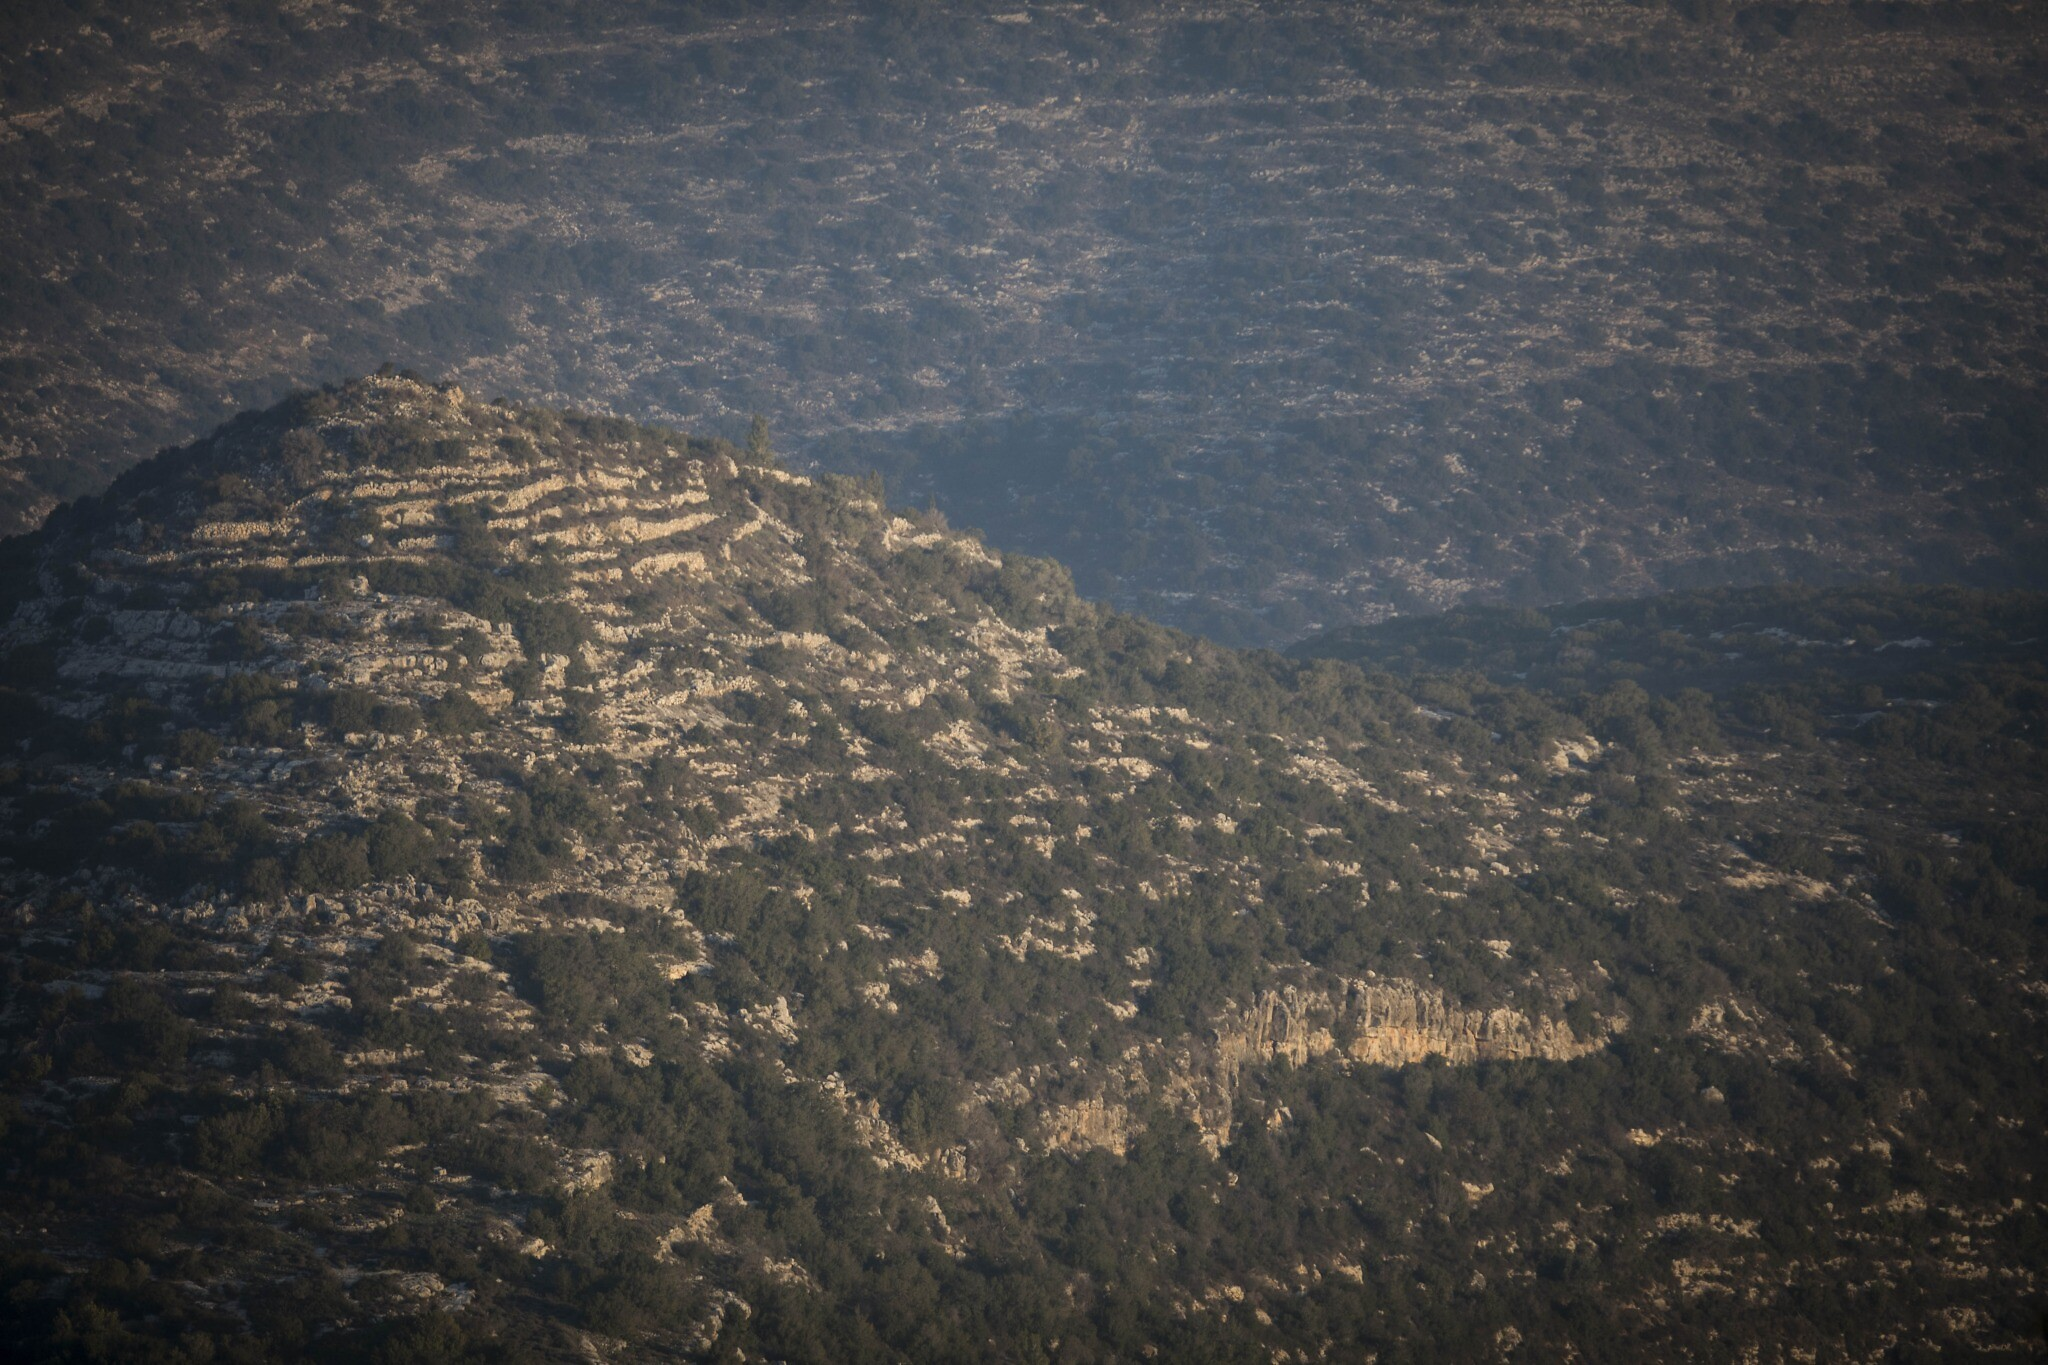 View of the Jerusalem hills from Ein Kerem, January 22, 2017.(Nati Shohat/Flash90)